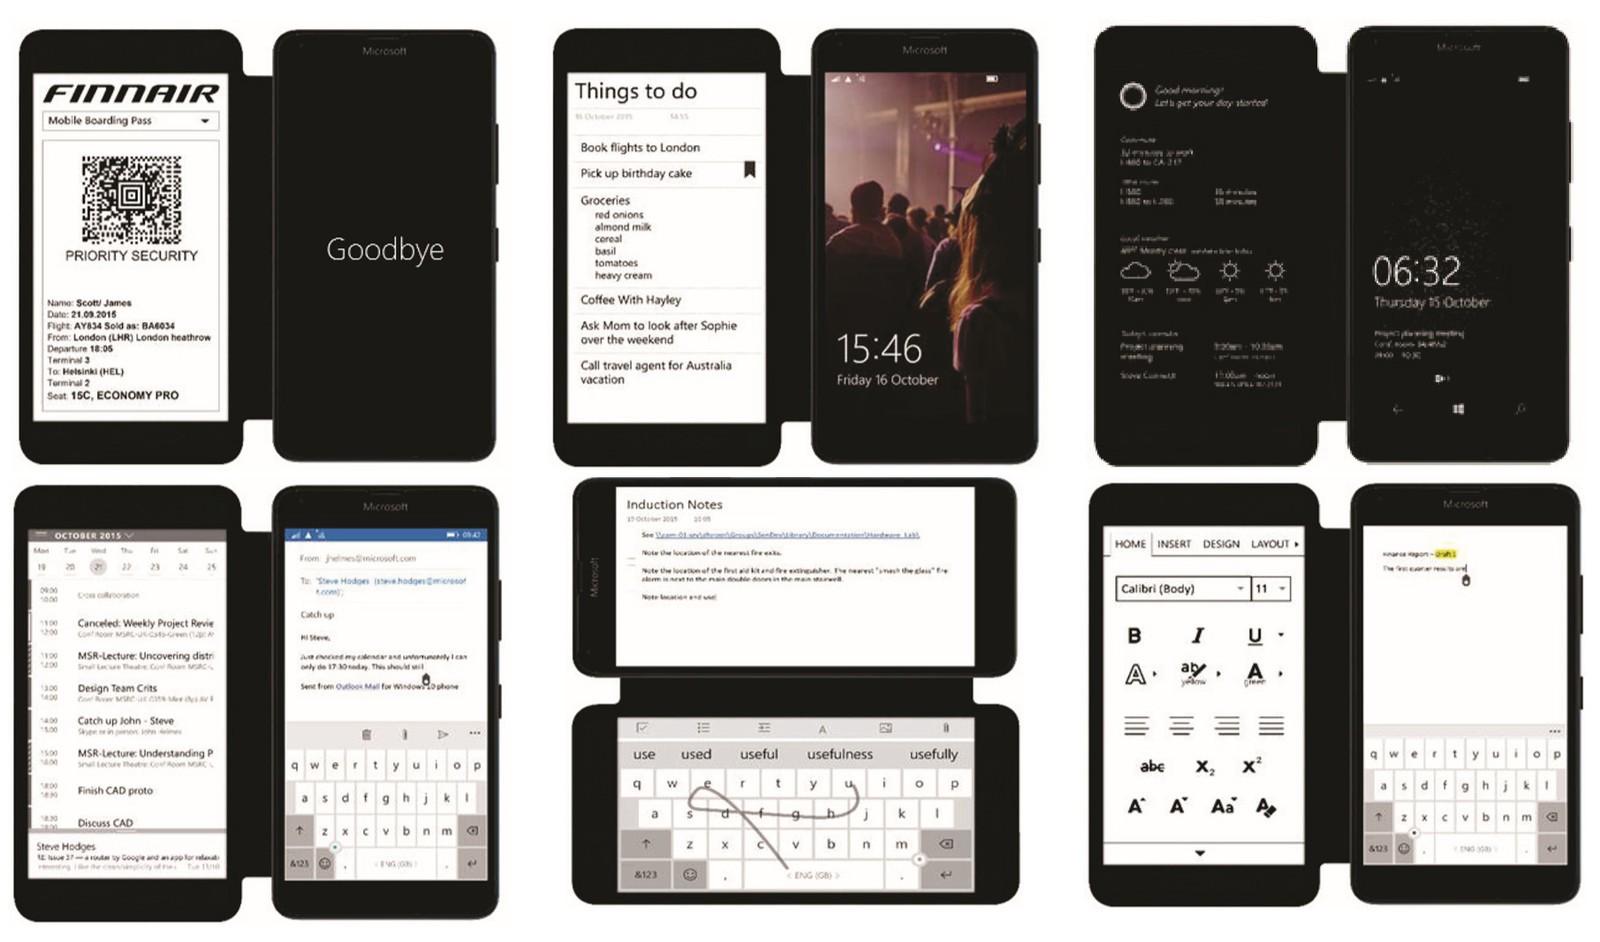 Microsoft-Andromeda-cover-display-e-Ink